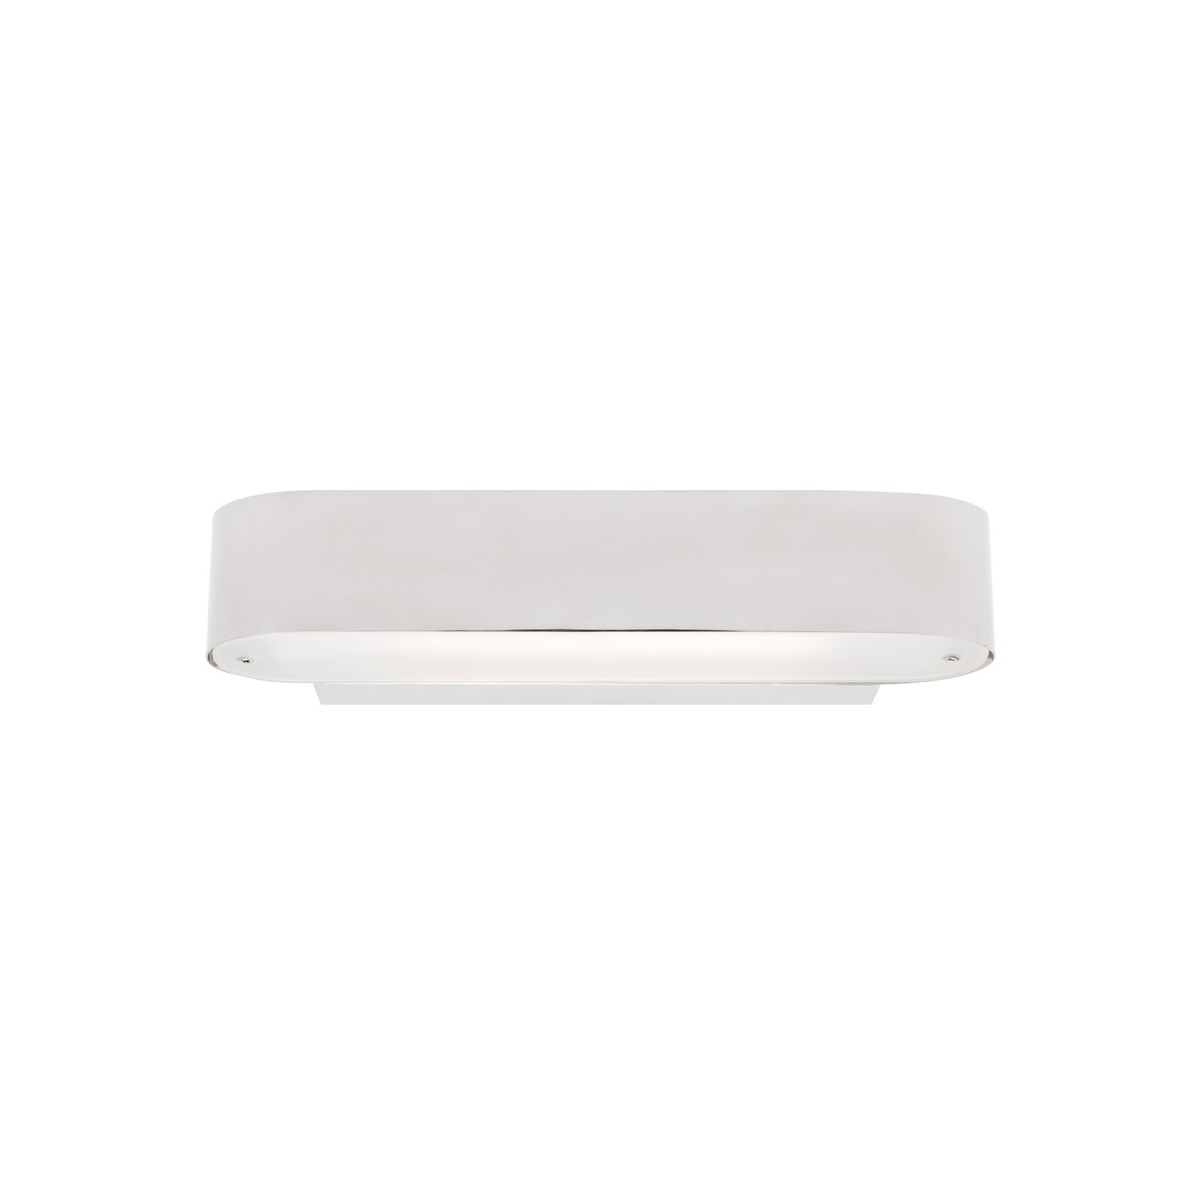 Fahrenheit PL Wall Light, Small